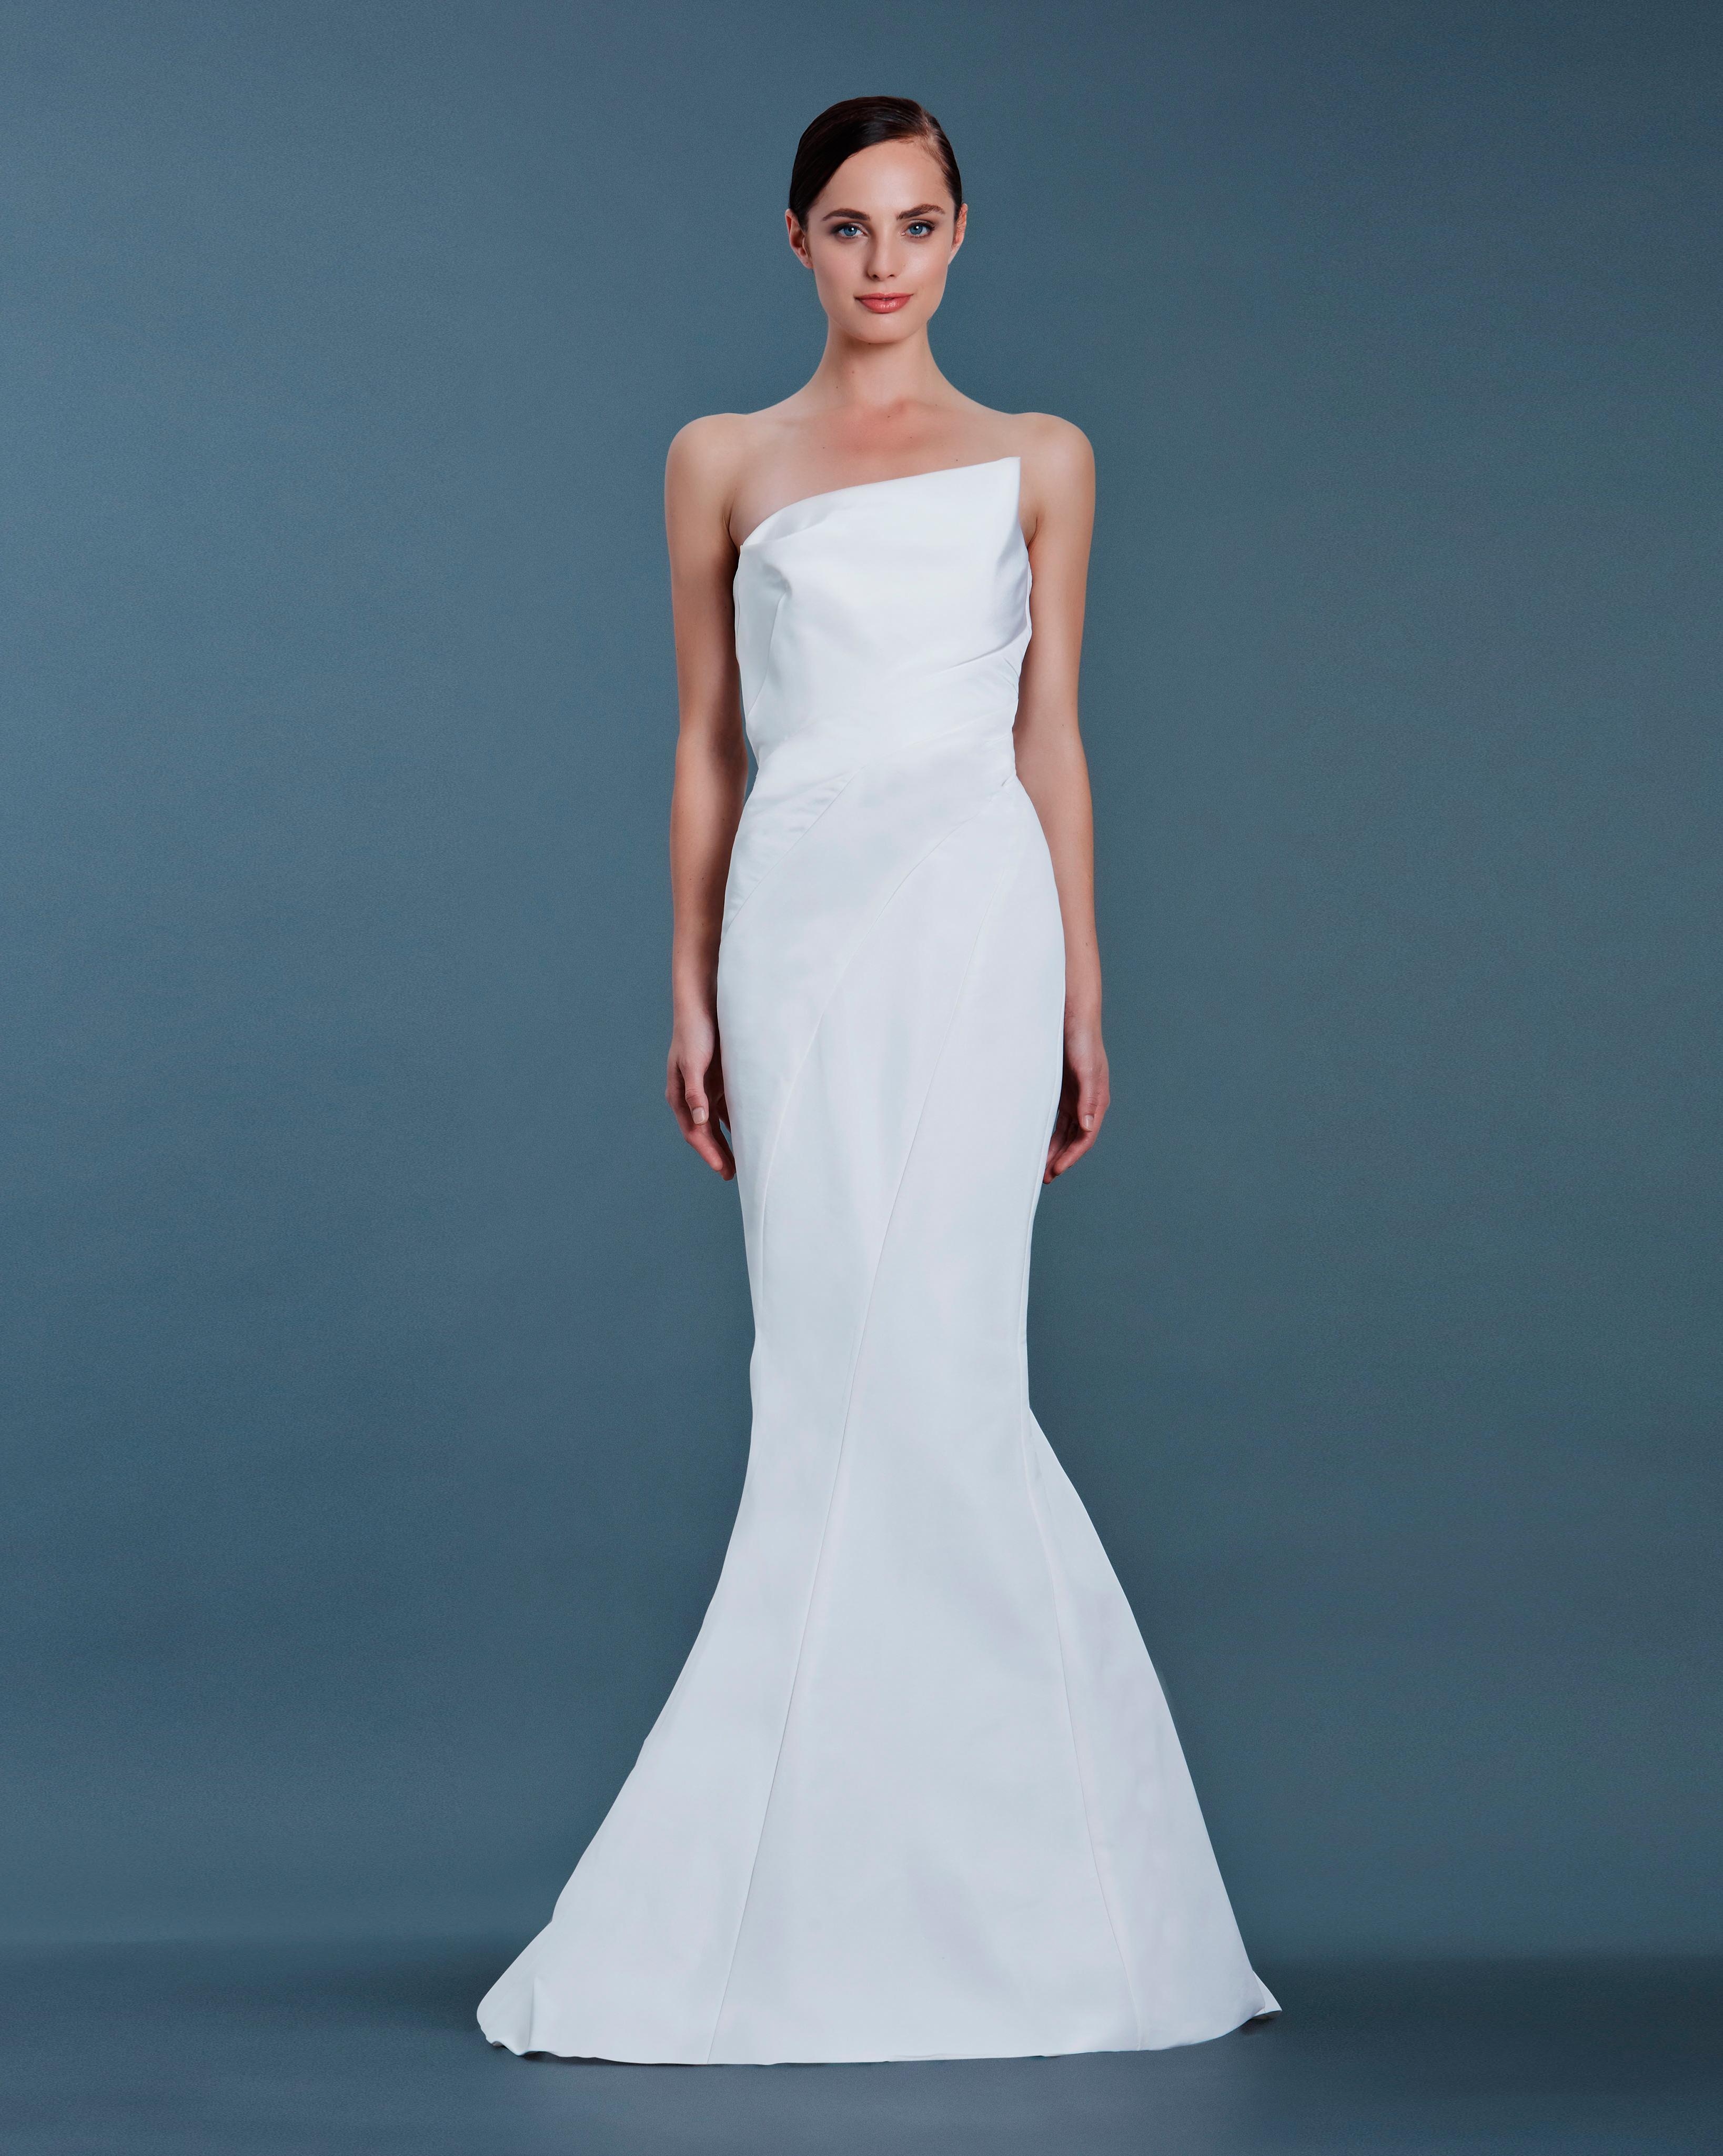 jmendel-fall2016-wedding-dress-9-madelyn.jpg